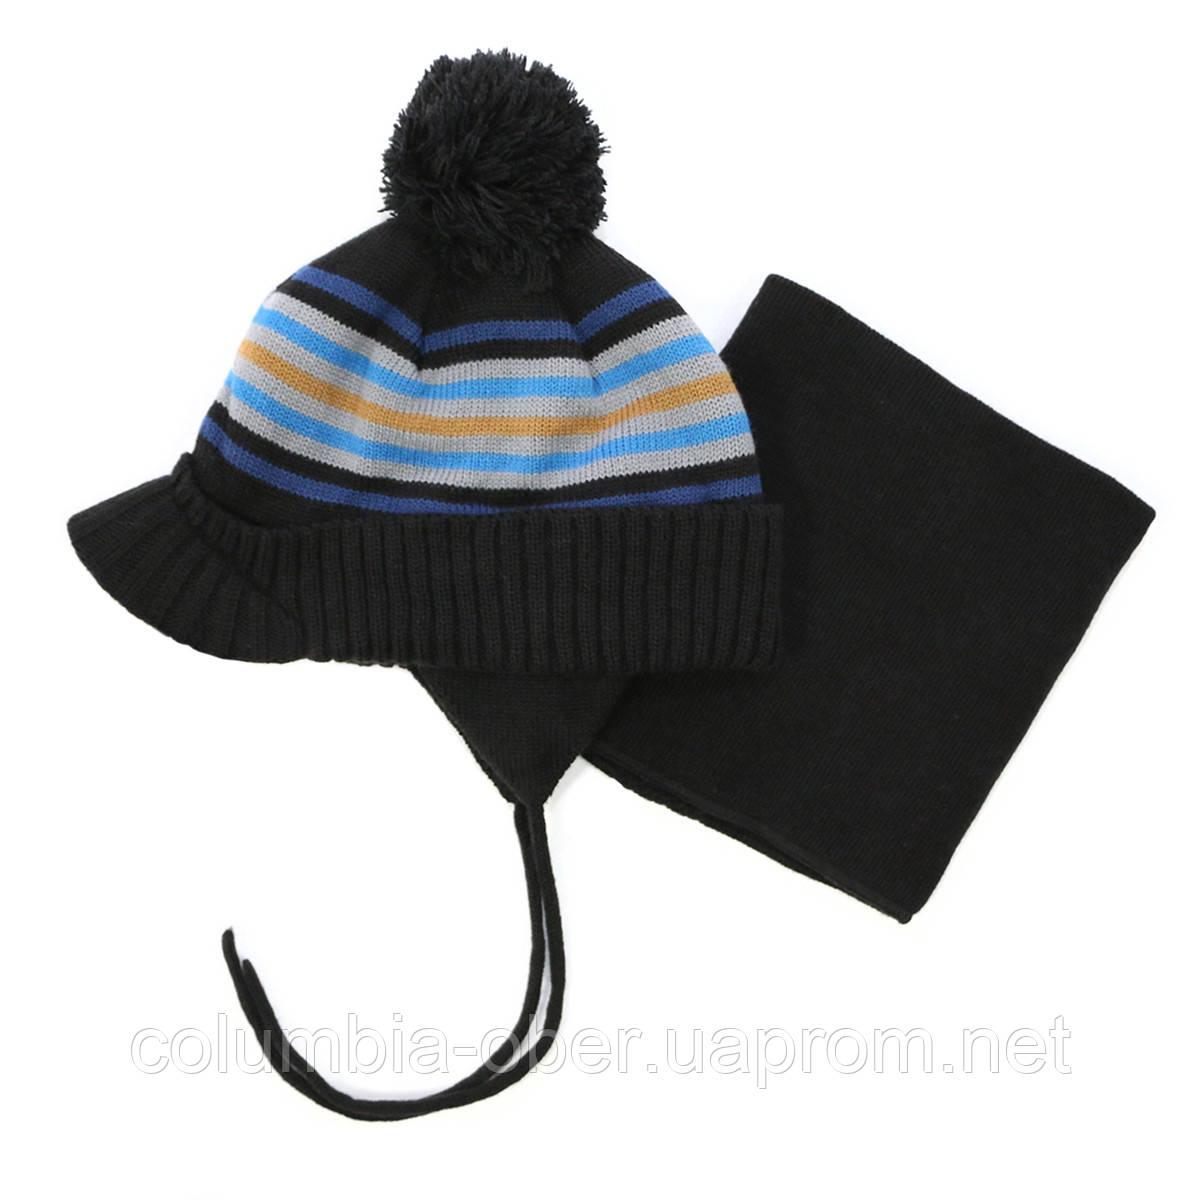 Зимняя шапка+манишка для мальчика PELUCHE 75 EG ACC F16 Black. Размер 3/5 и 6/8.